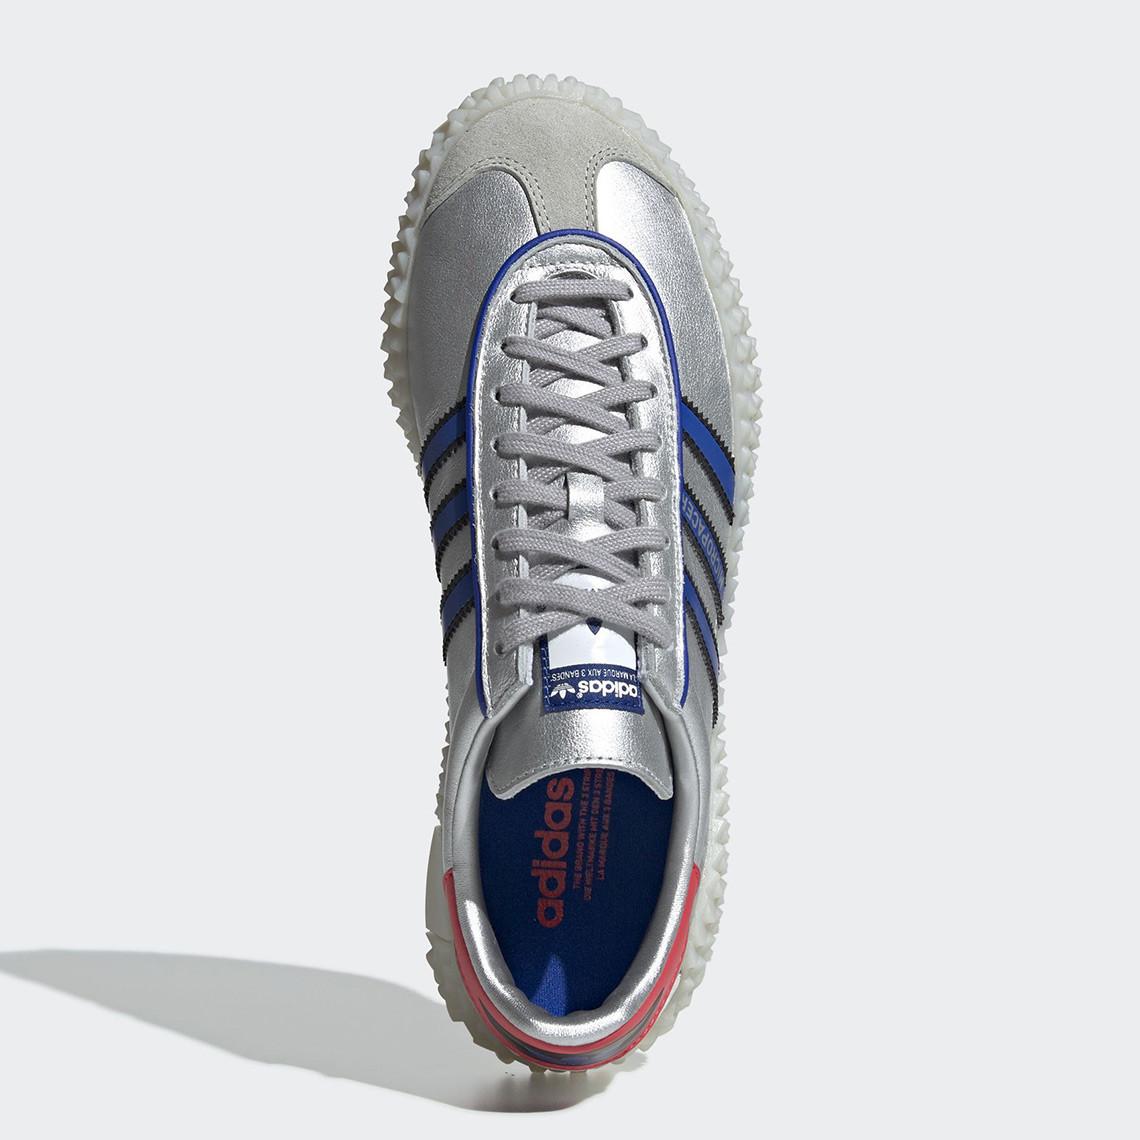 adidas-country-kamanda-micropacer-ef5546-5